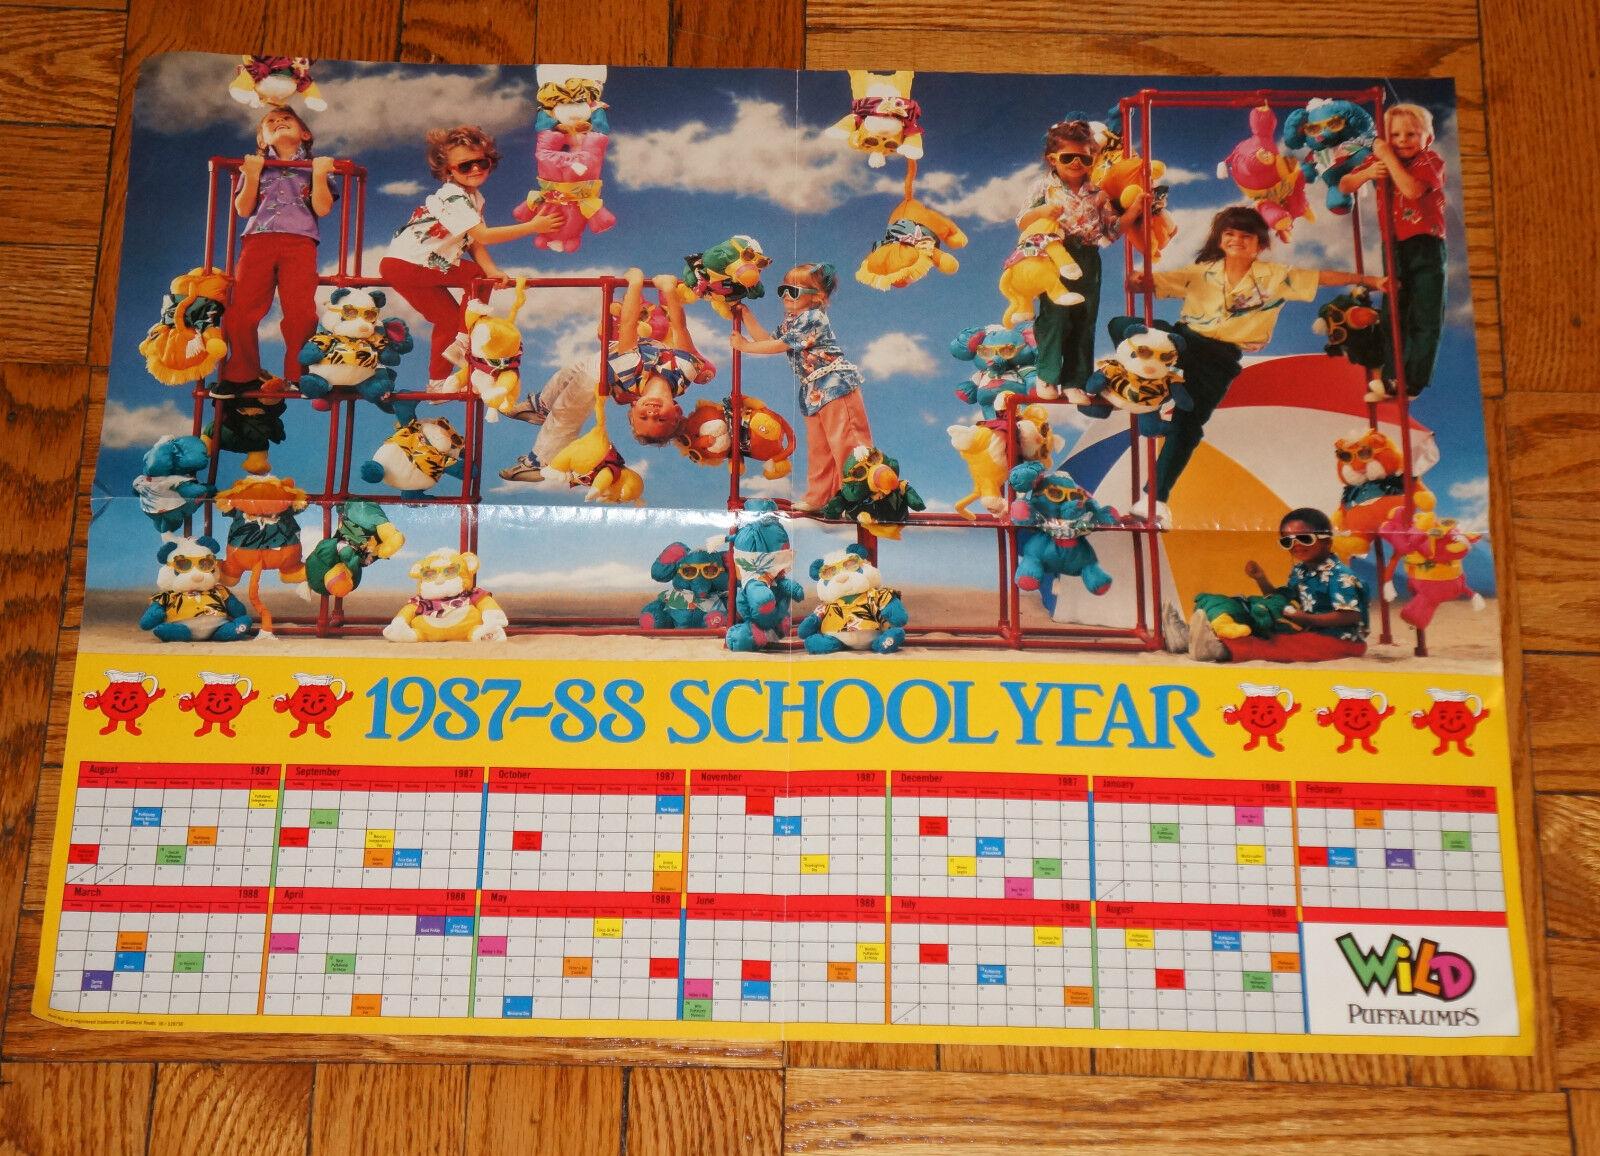 Fisher Price PUFFALUMP POSTER 1987 1988 School Year KOOL STÖD årgång 1980 -talet